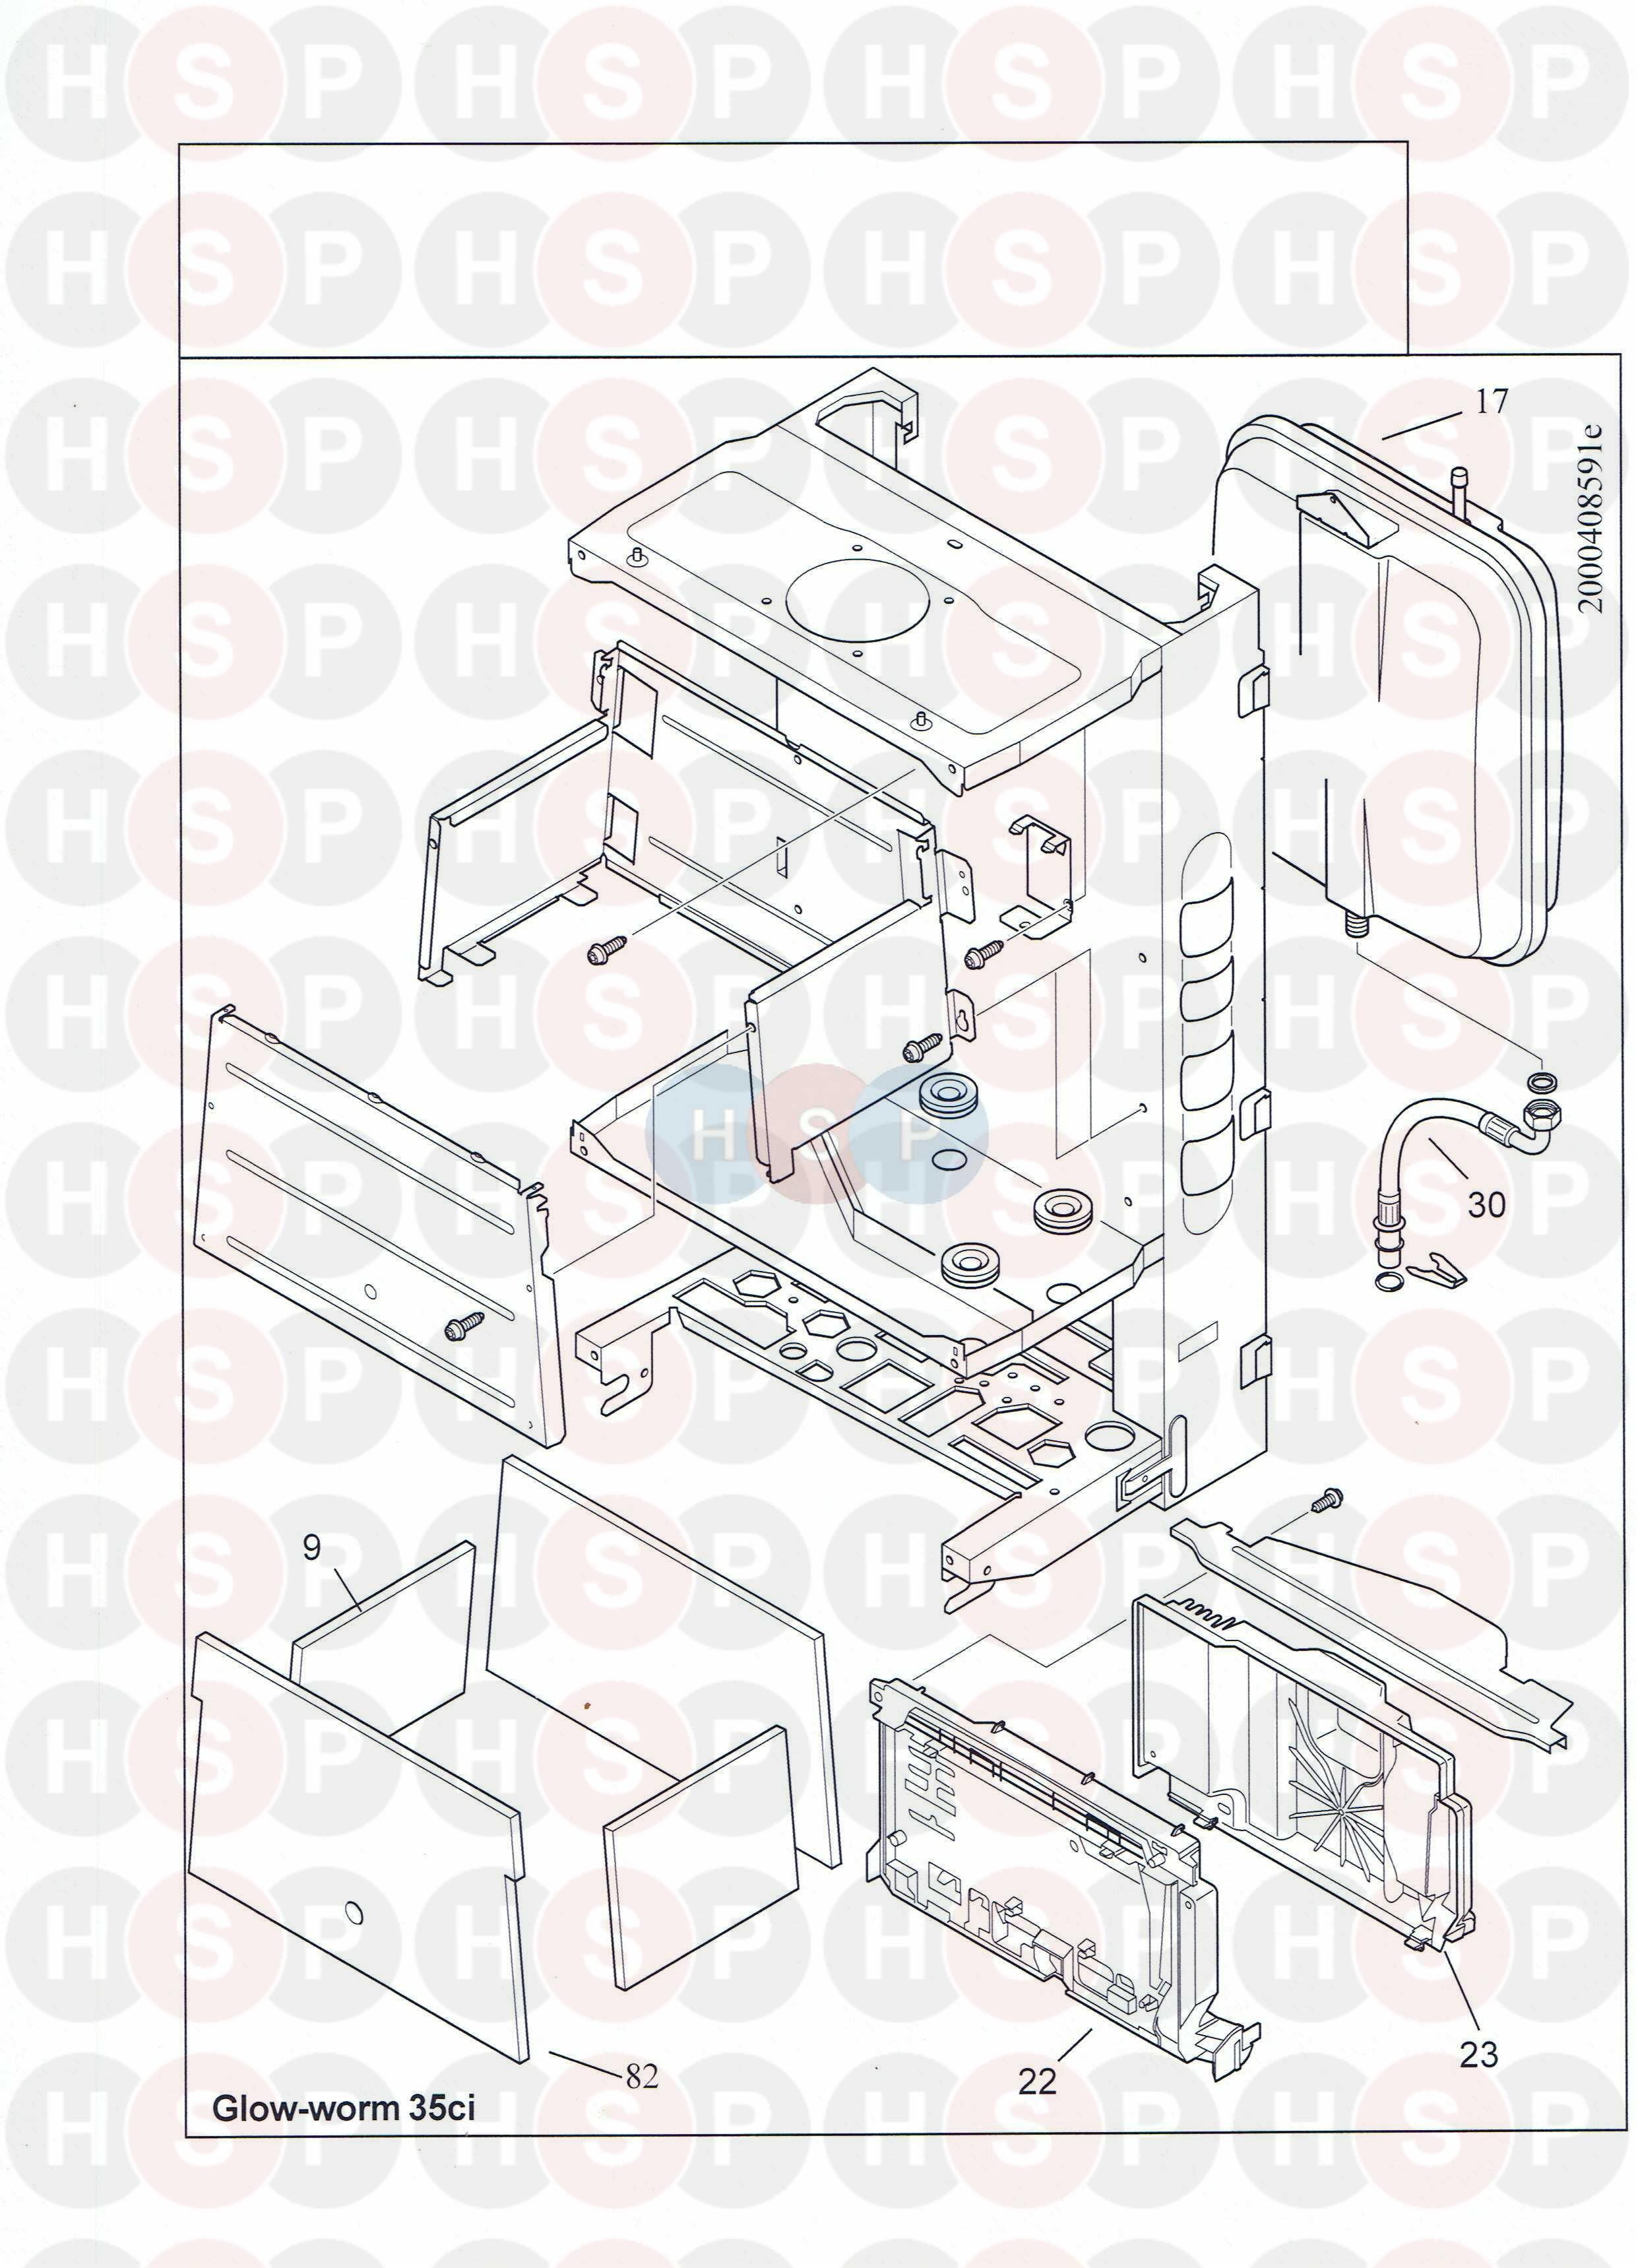 Glowworm GLOWWORM 35CI (Expansion vessel) Diagram | Heating Spare Parts